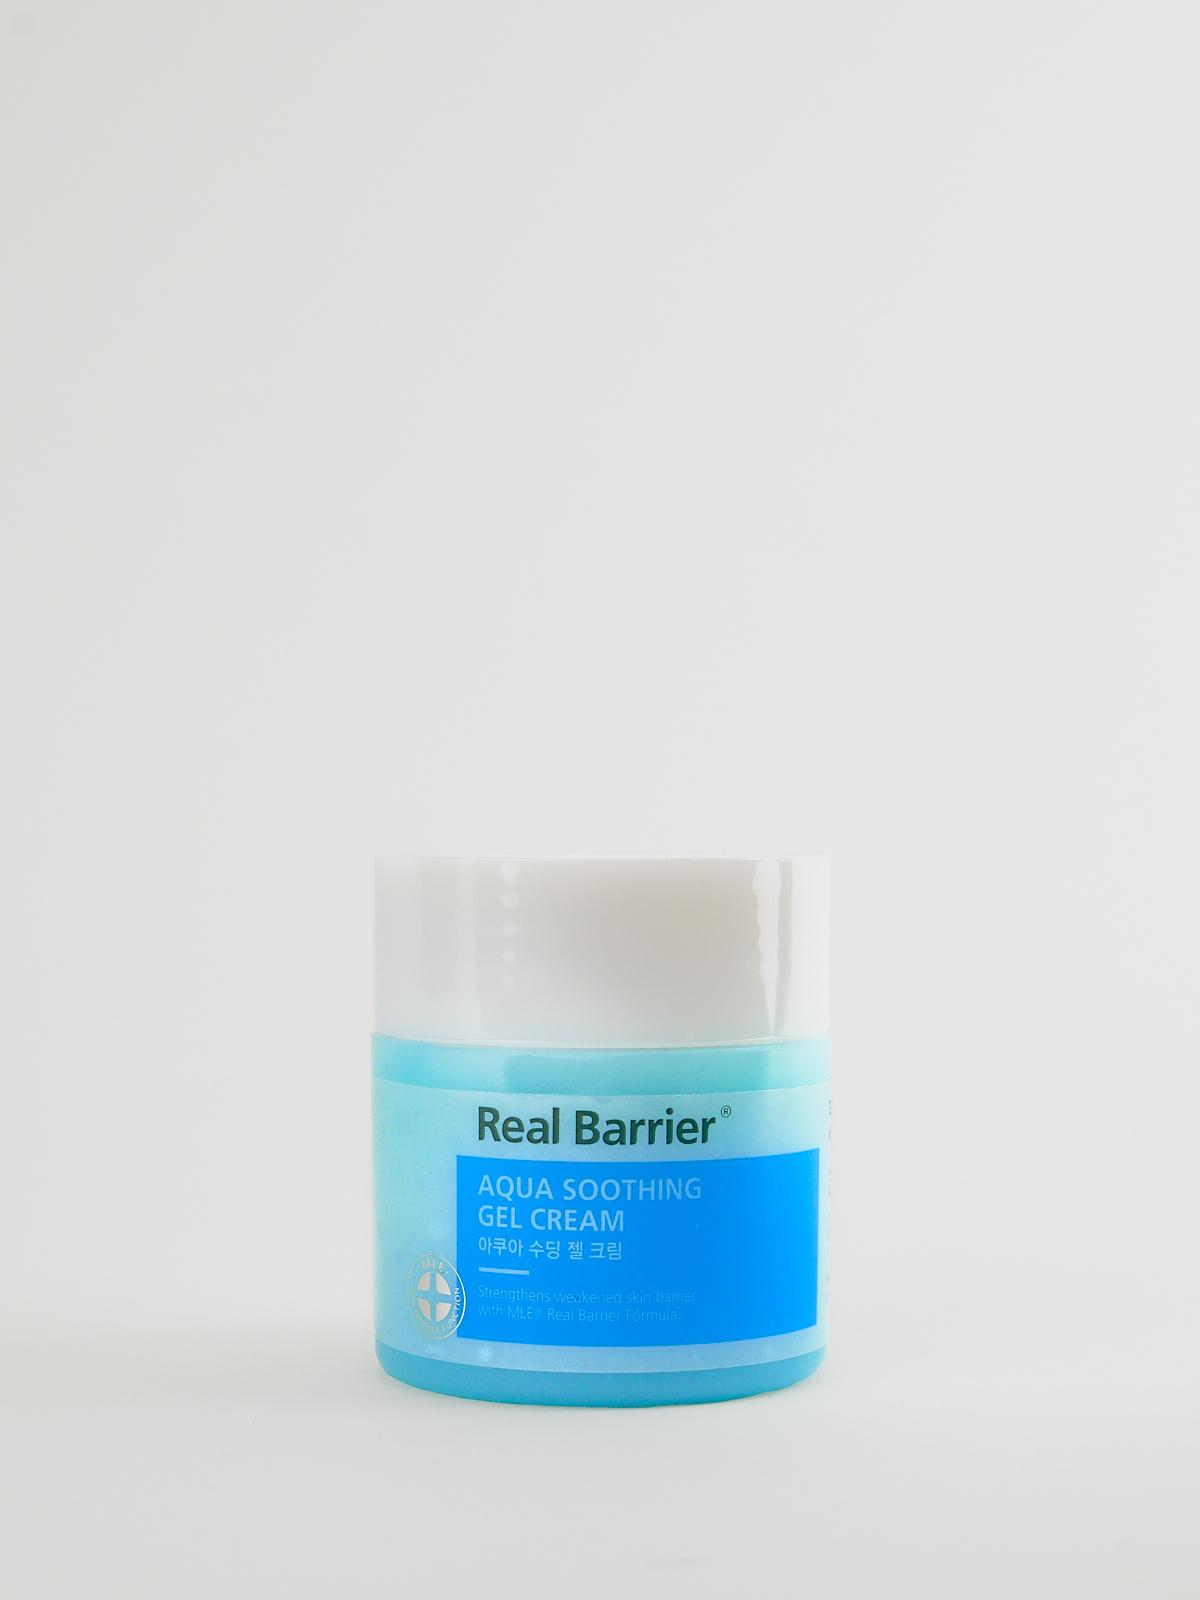 Real Barrier Aqua Soothing Gel Cream in türkisiner Dose